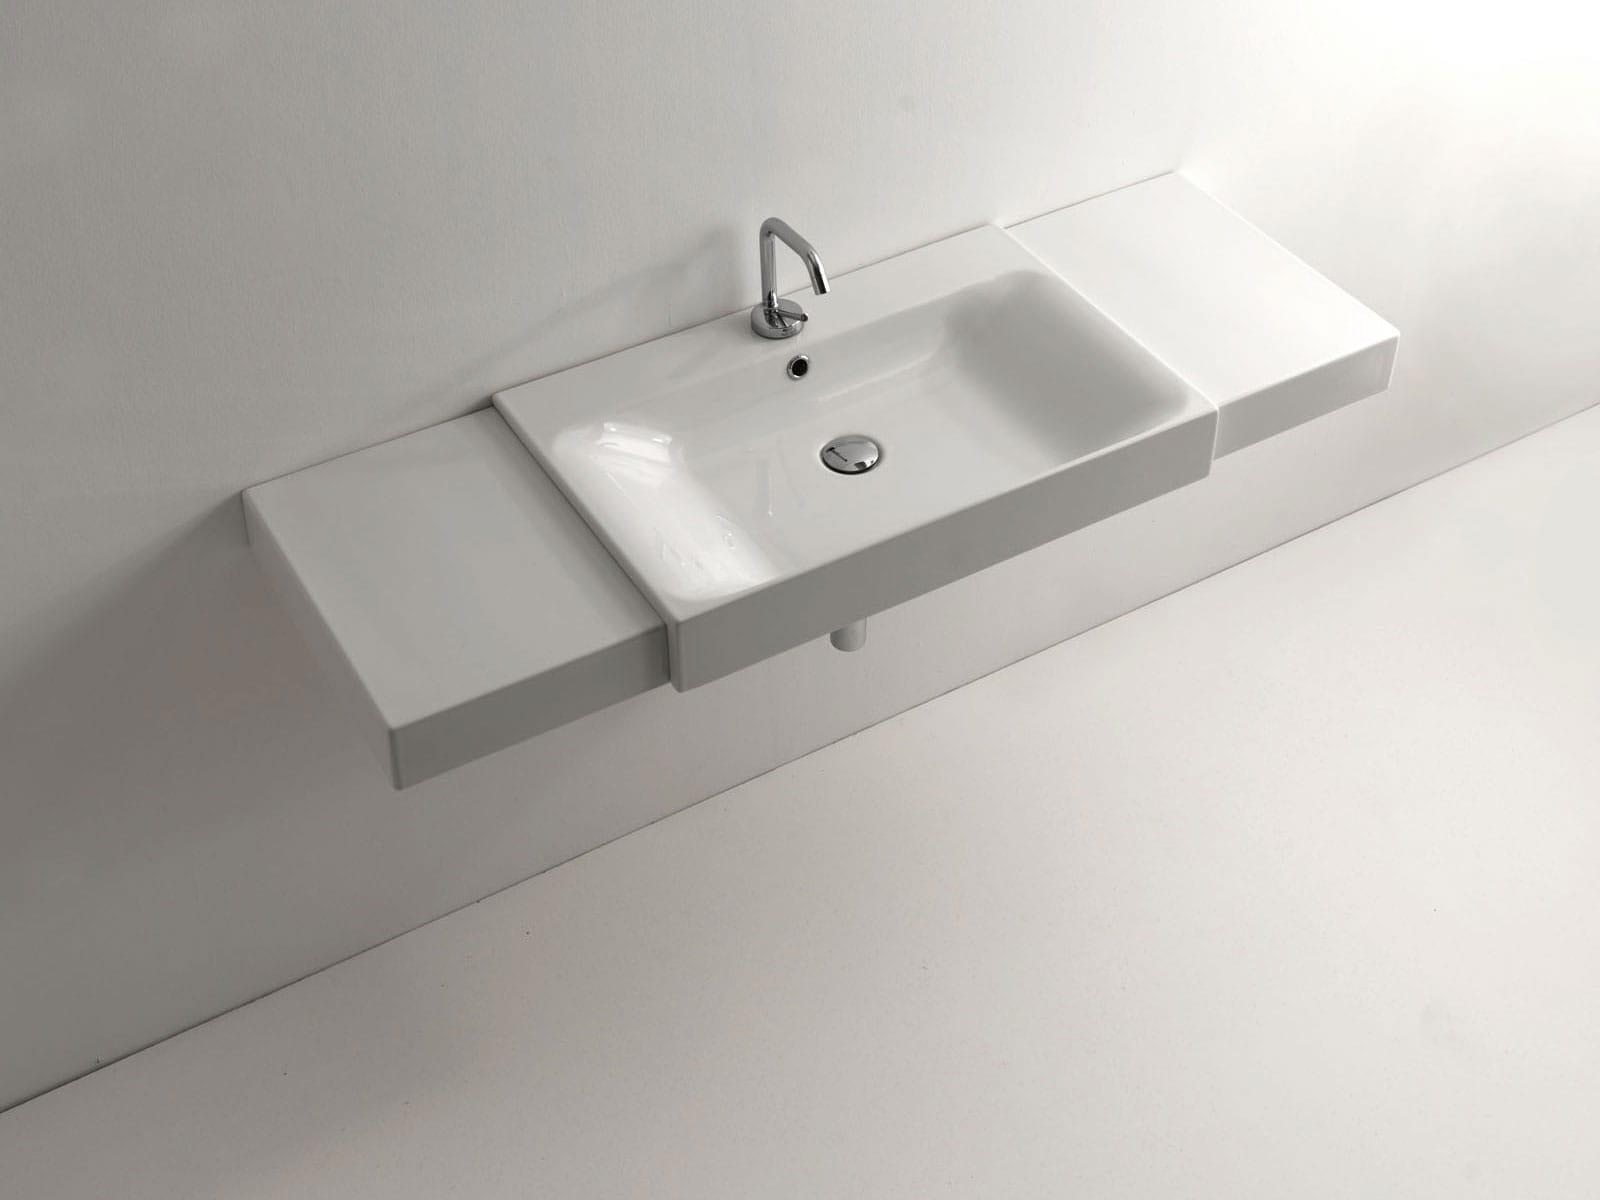 umywalka semincasso kerasan cento 50 x 45 cm domoshop. Black Bedroom Furniture Sets. Home Design Ideas